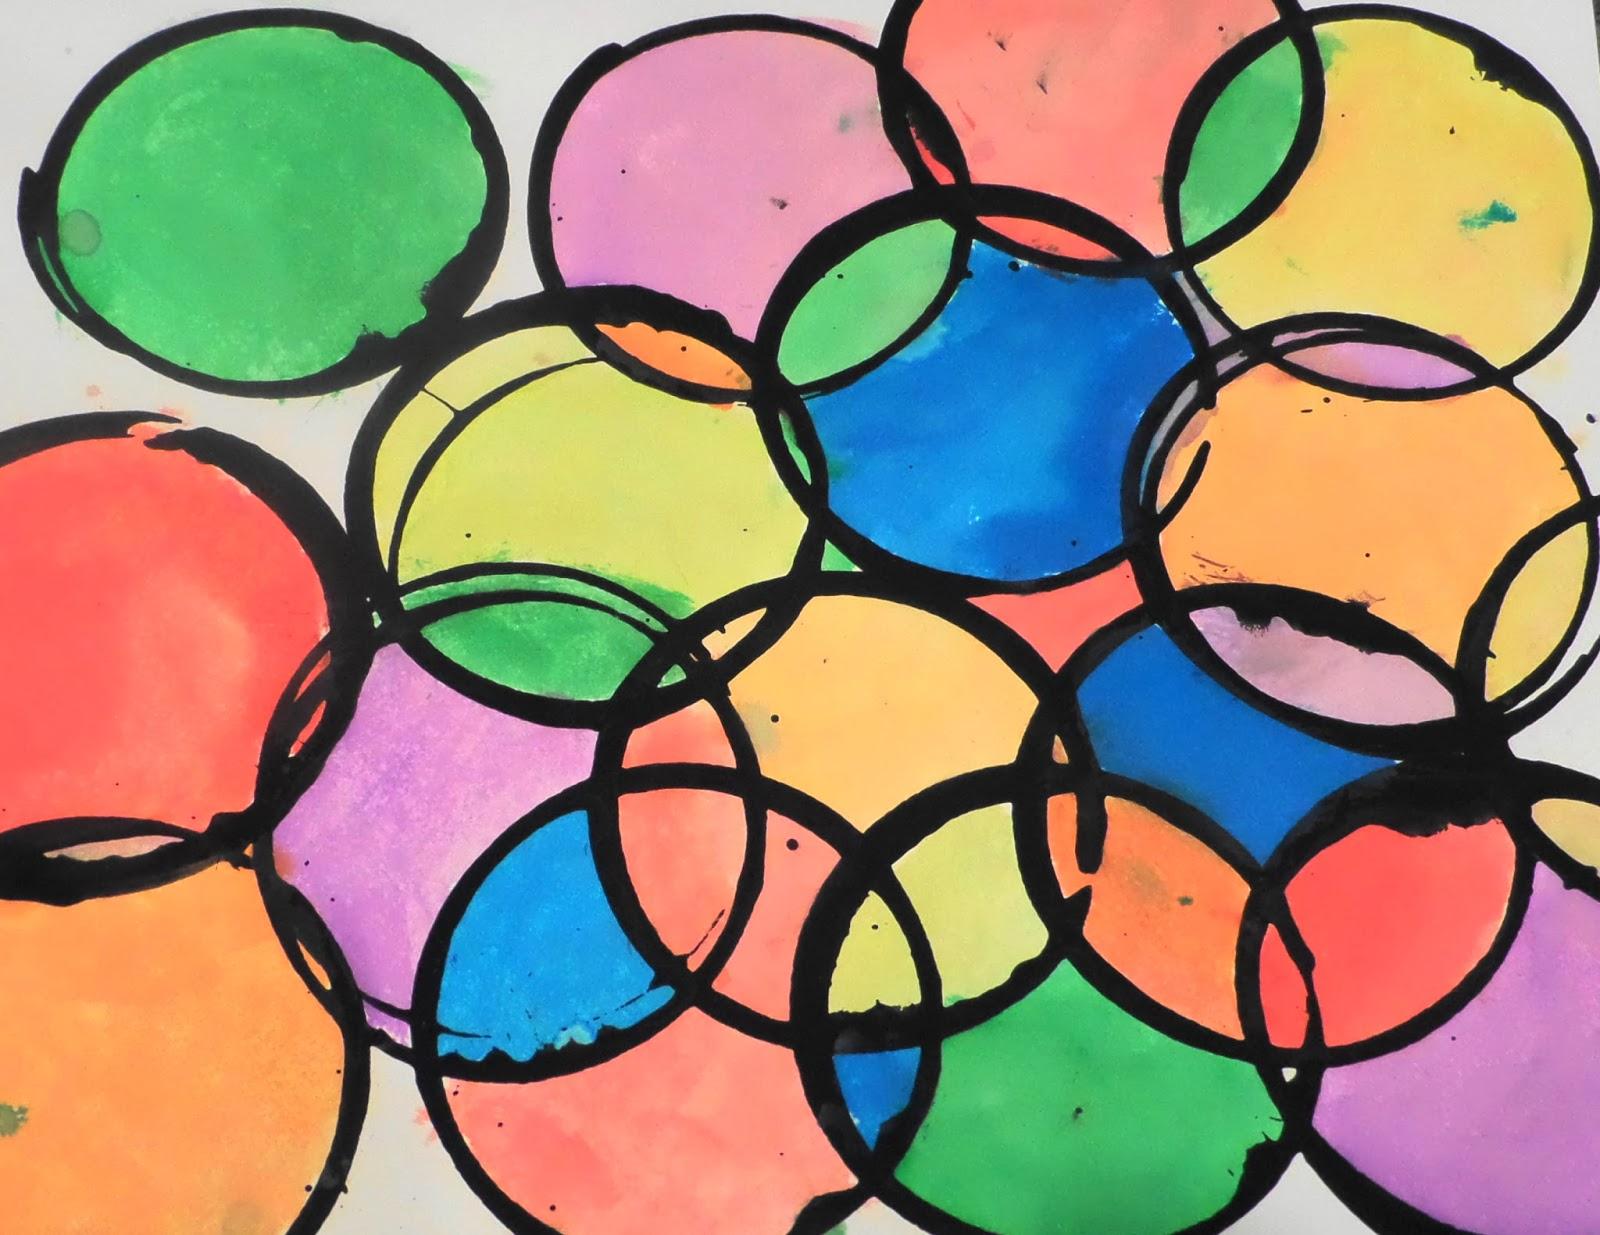 10 geometric art explorations for math learning - HD1600×1235